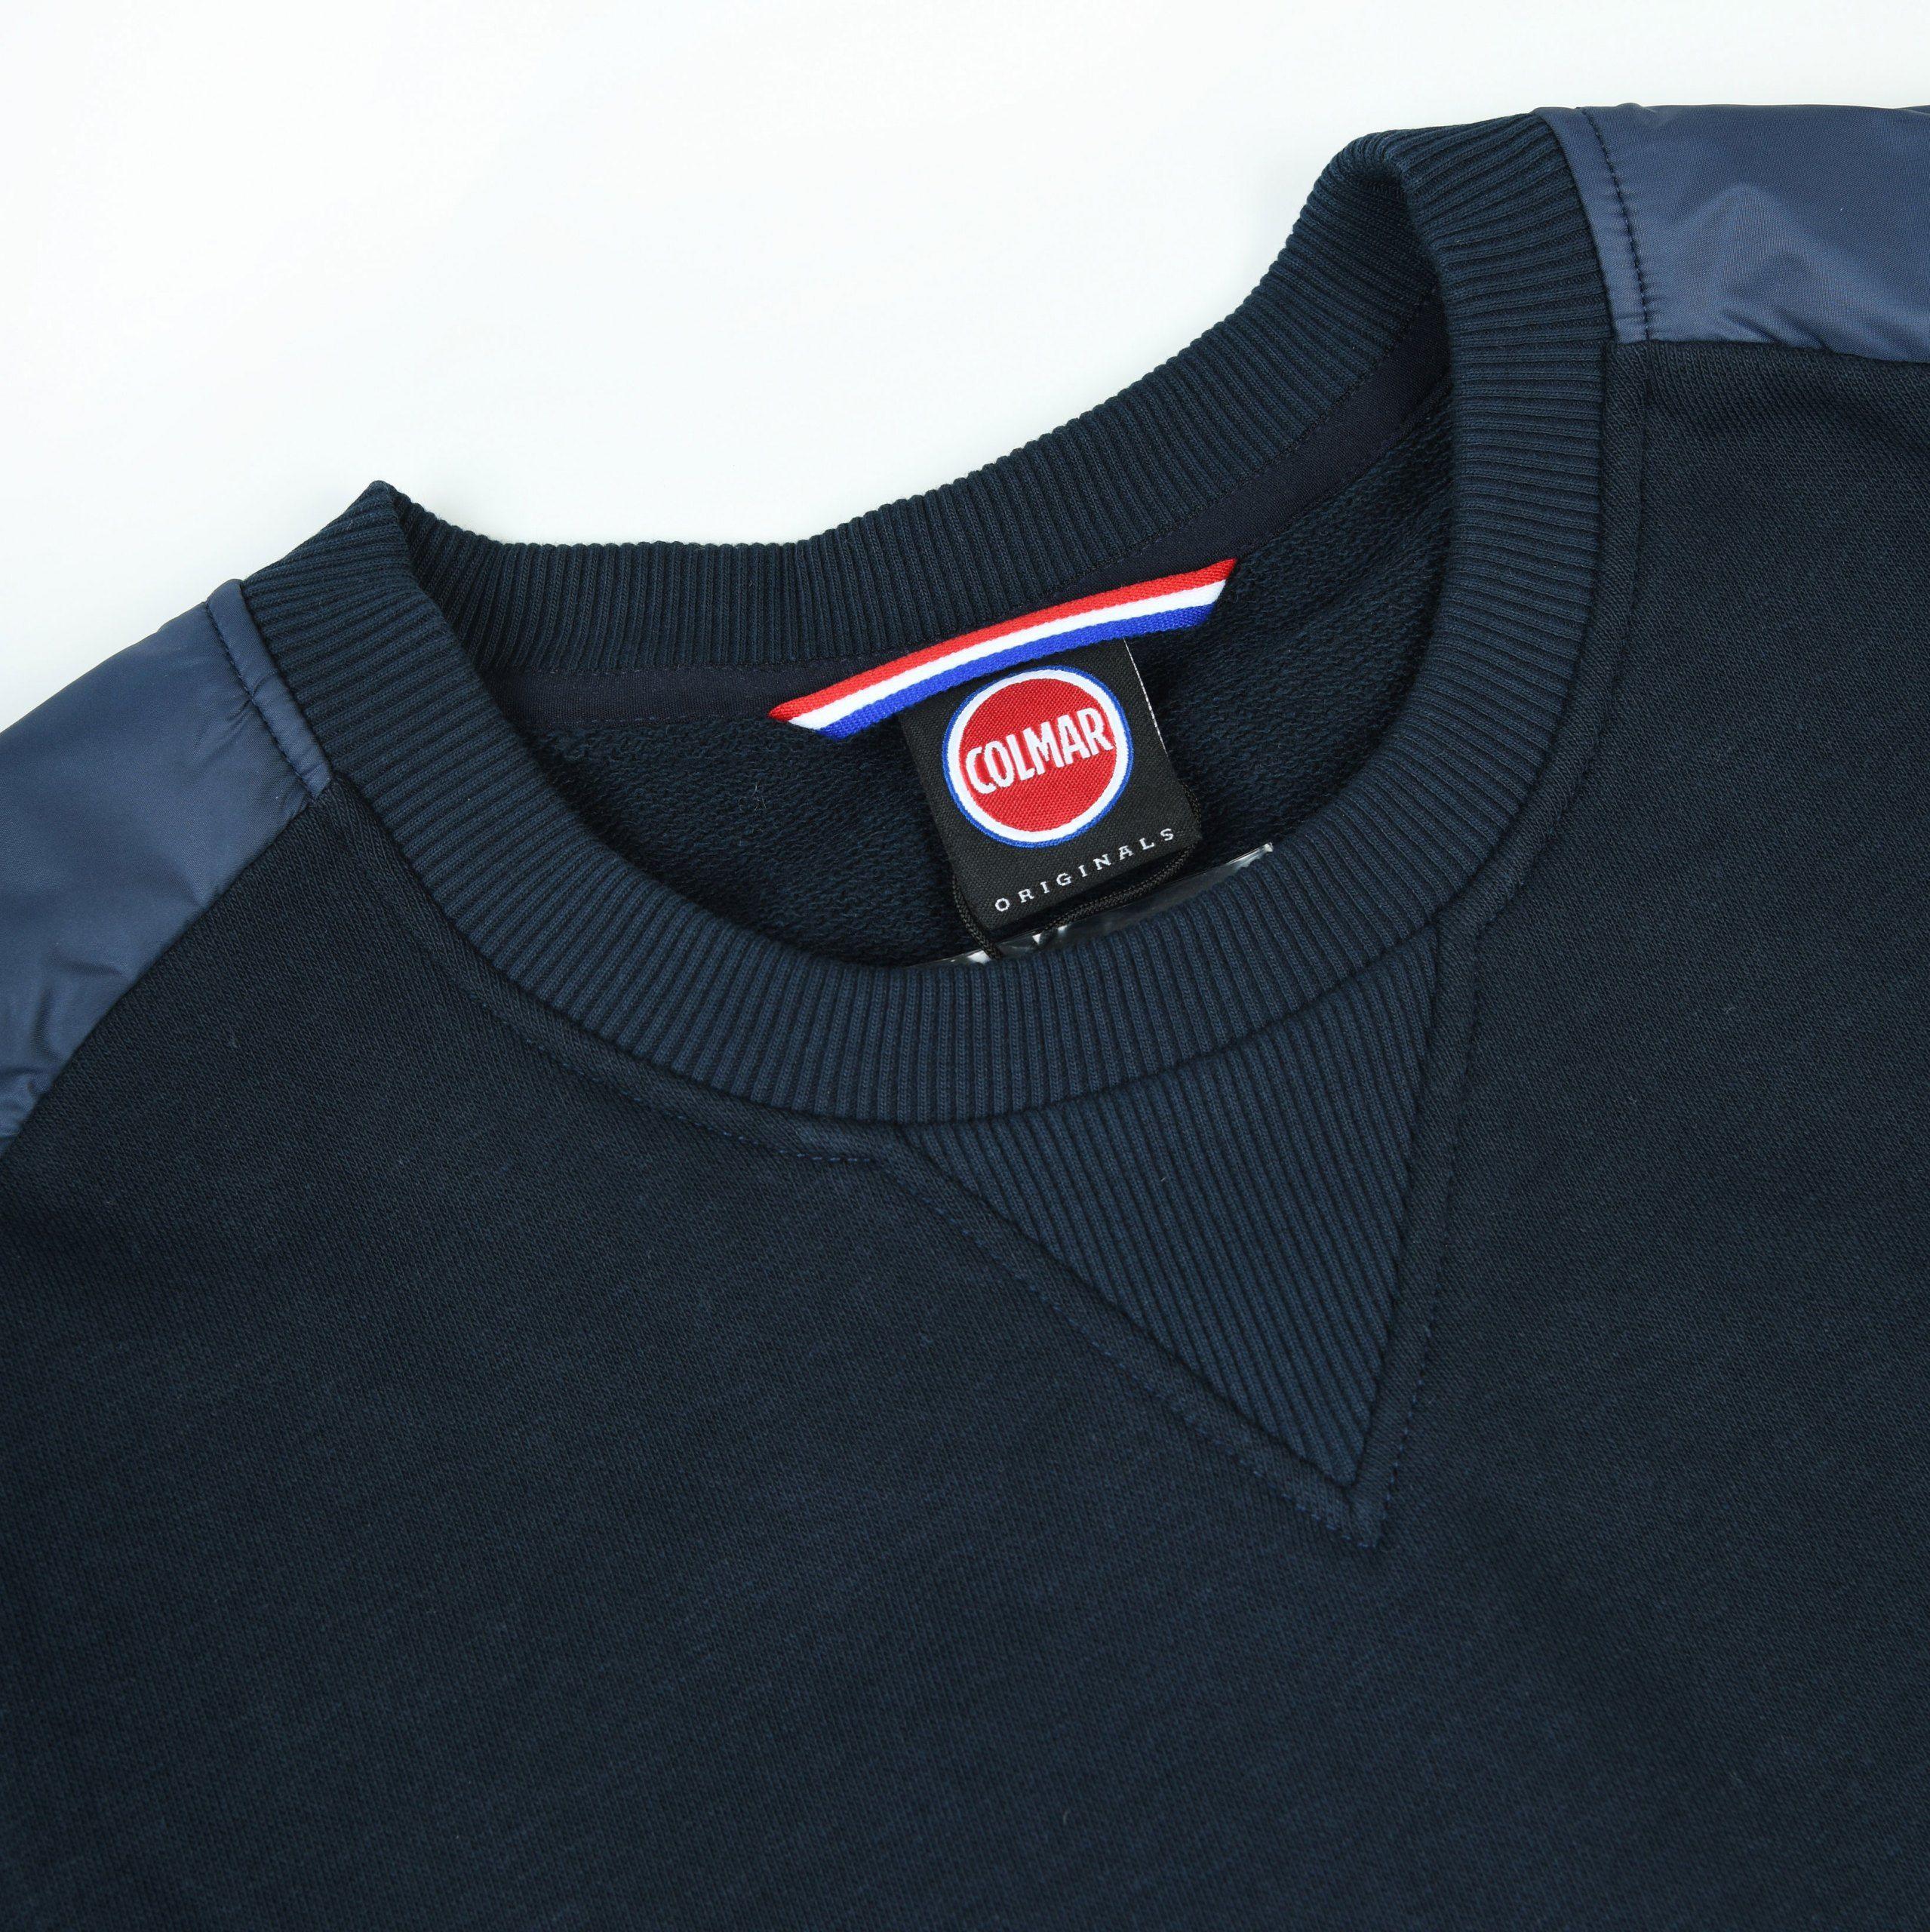 Poloshow Colmar Sweater Dunkelblau 68 8224 6QC 3